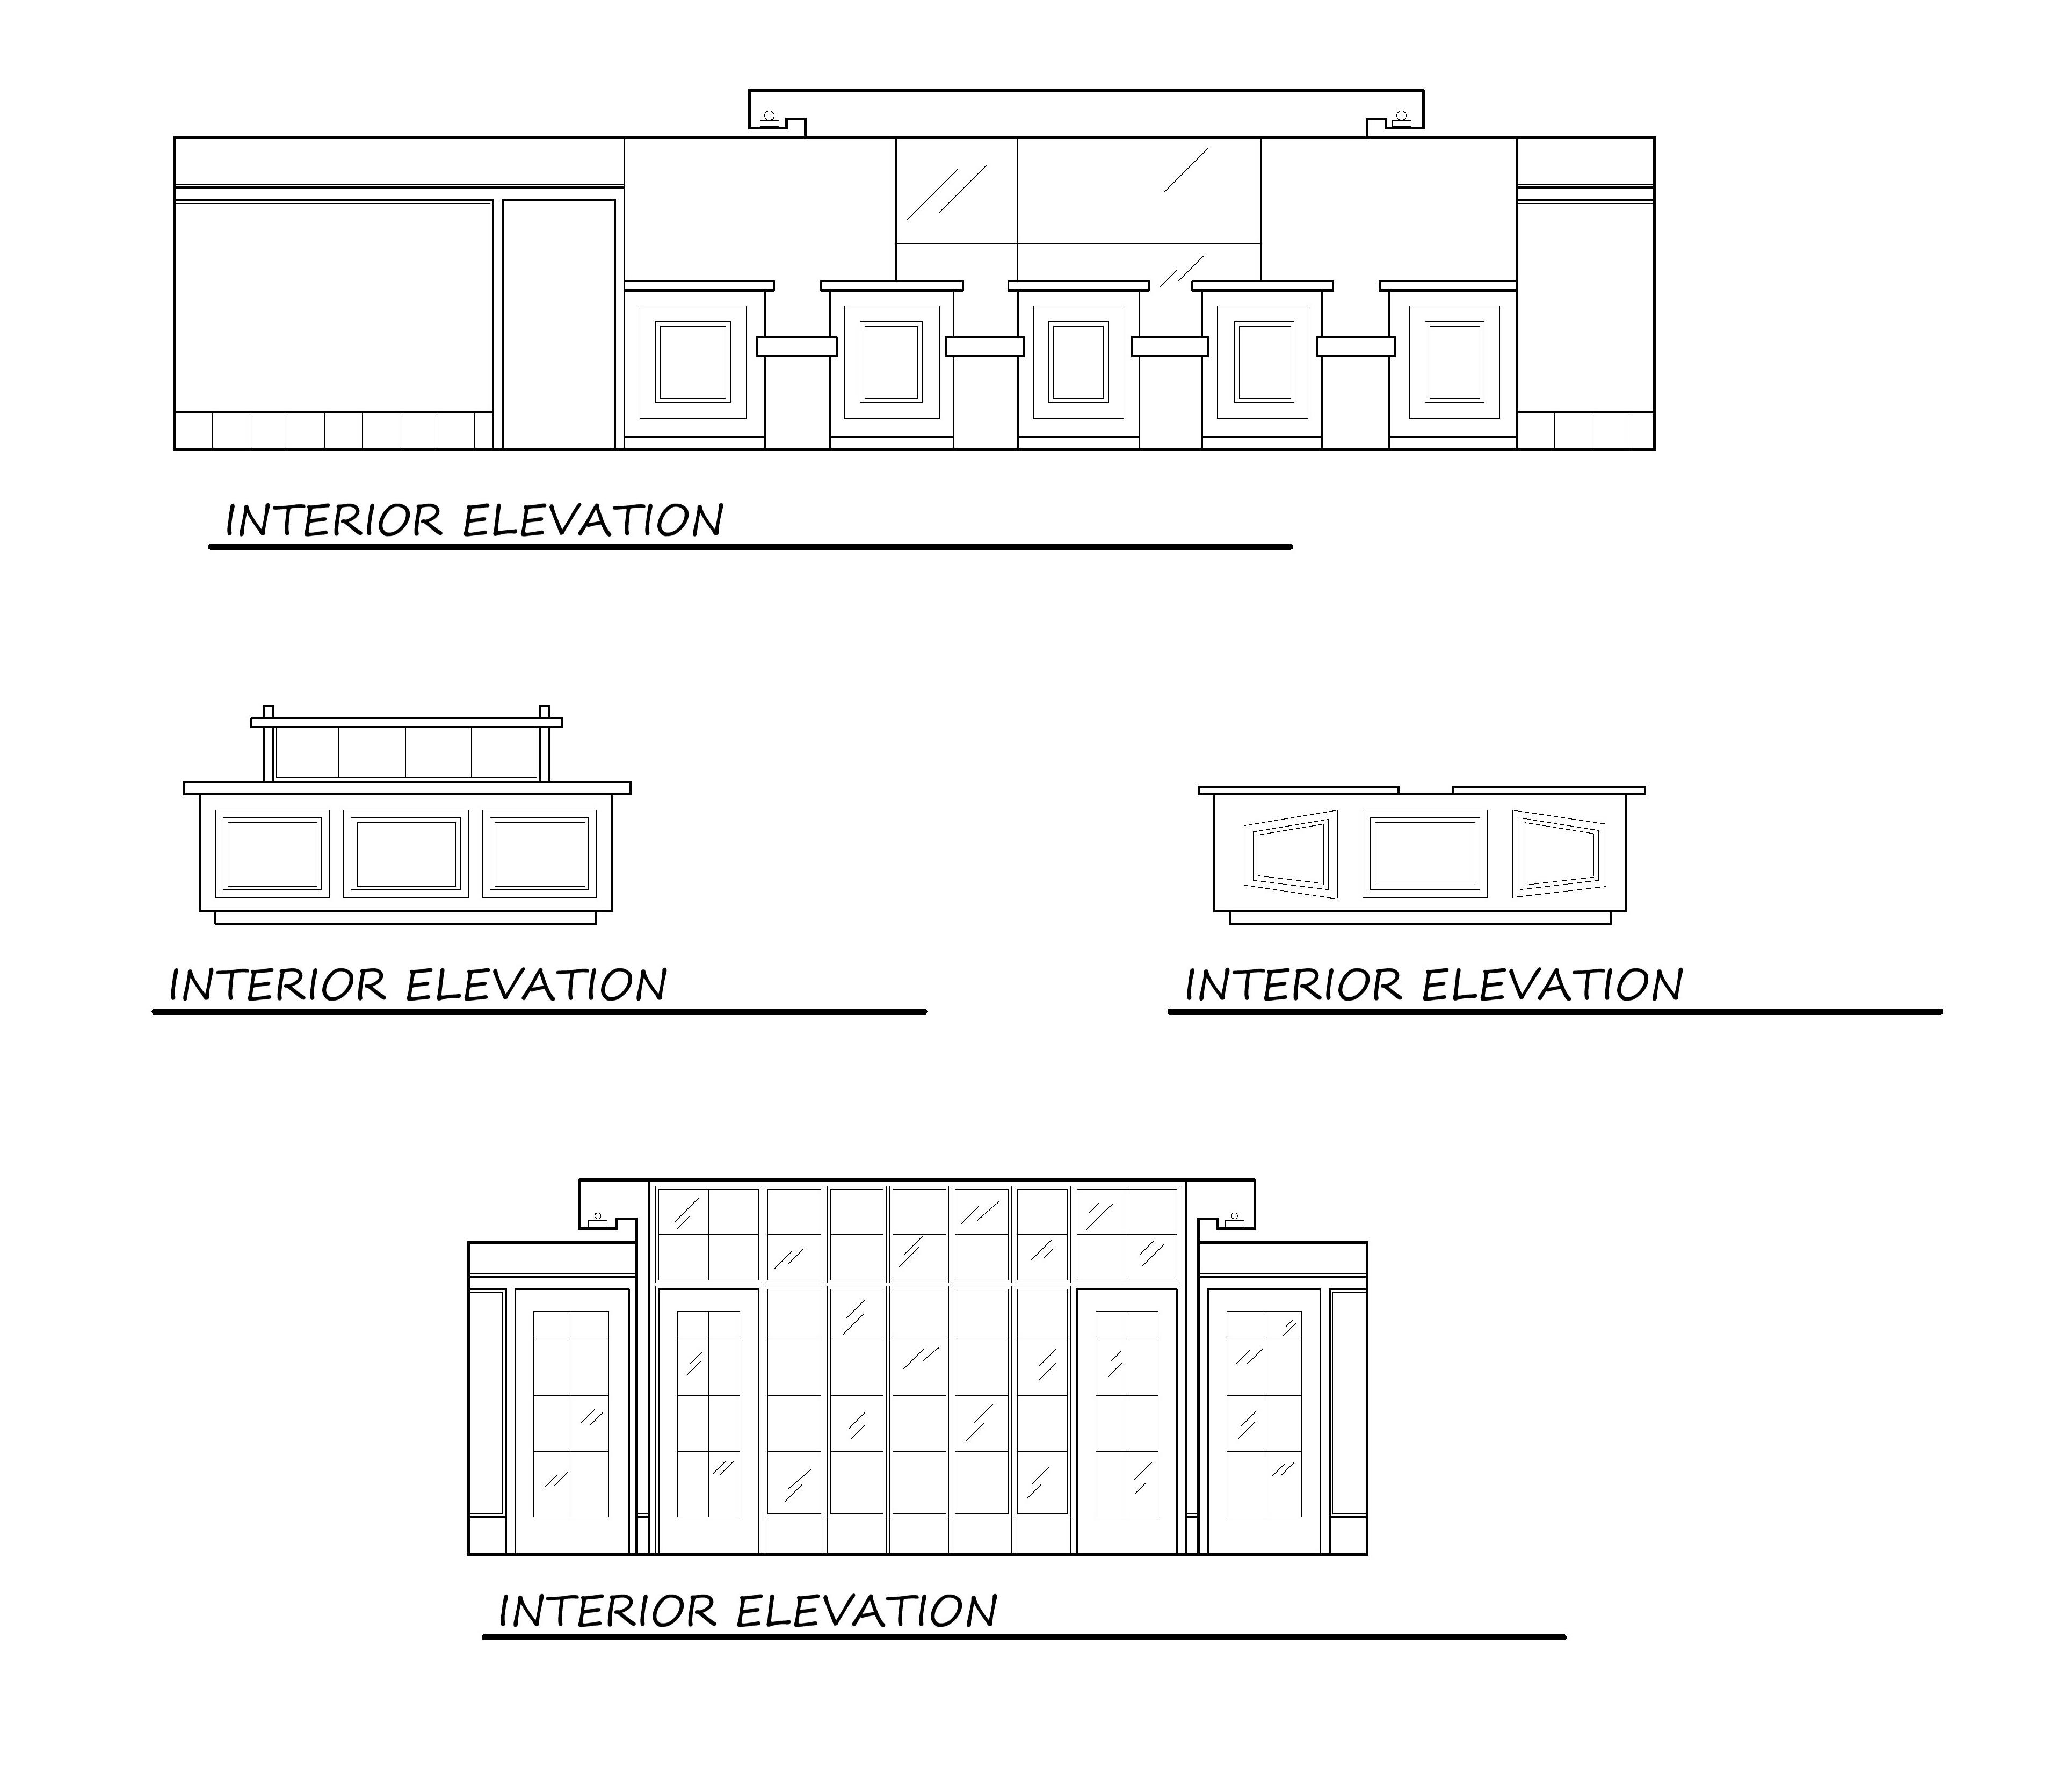 Horizon Bank Interior Elevations